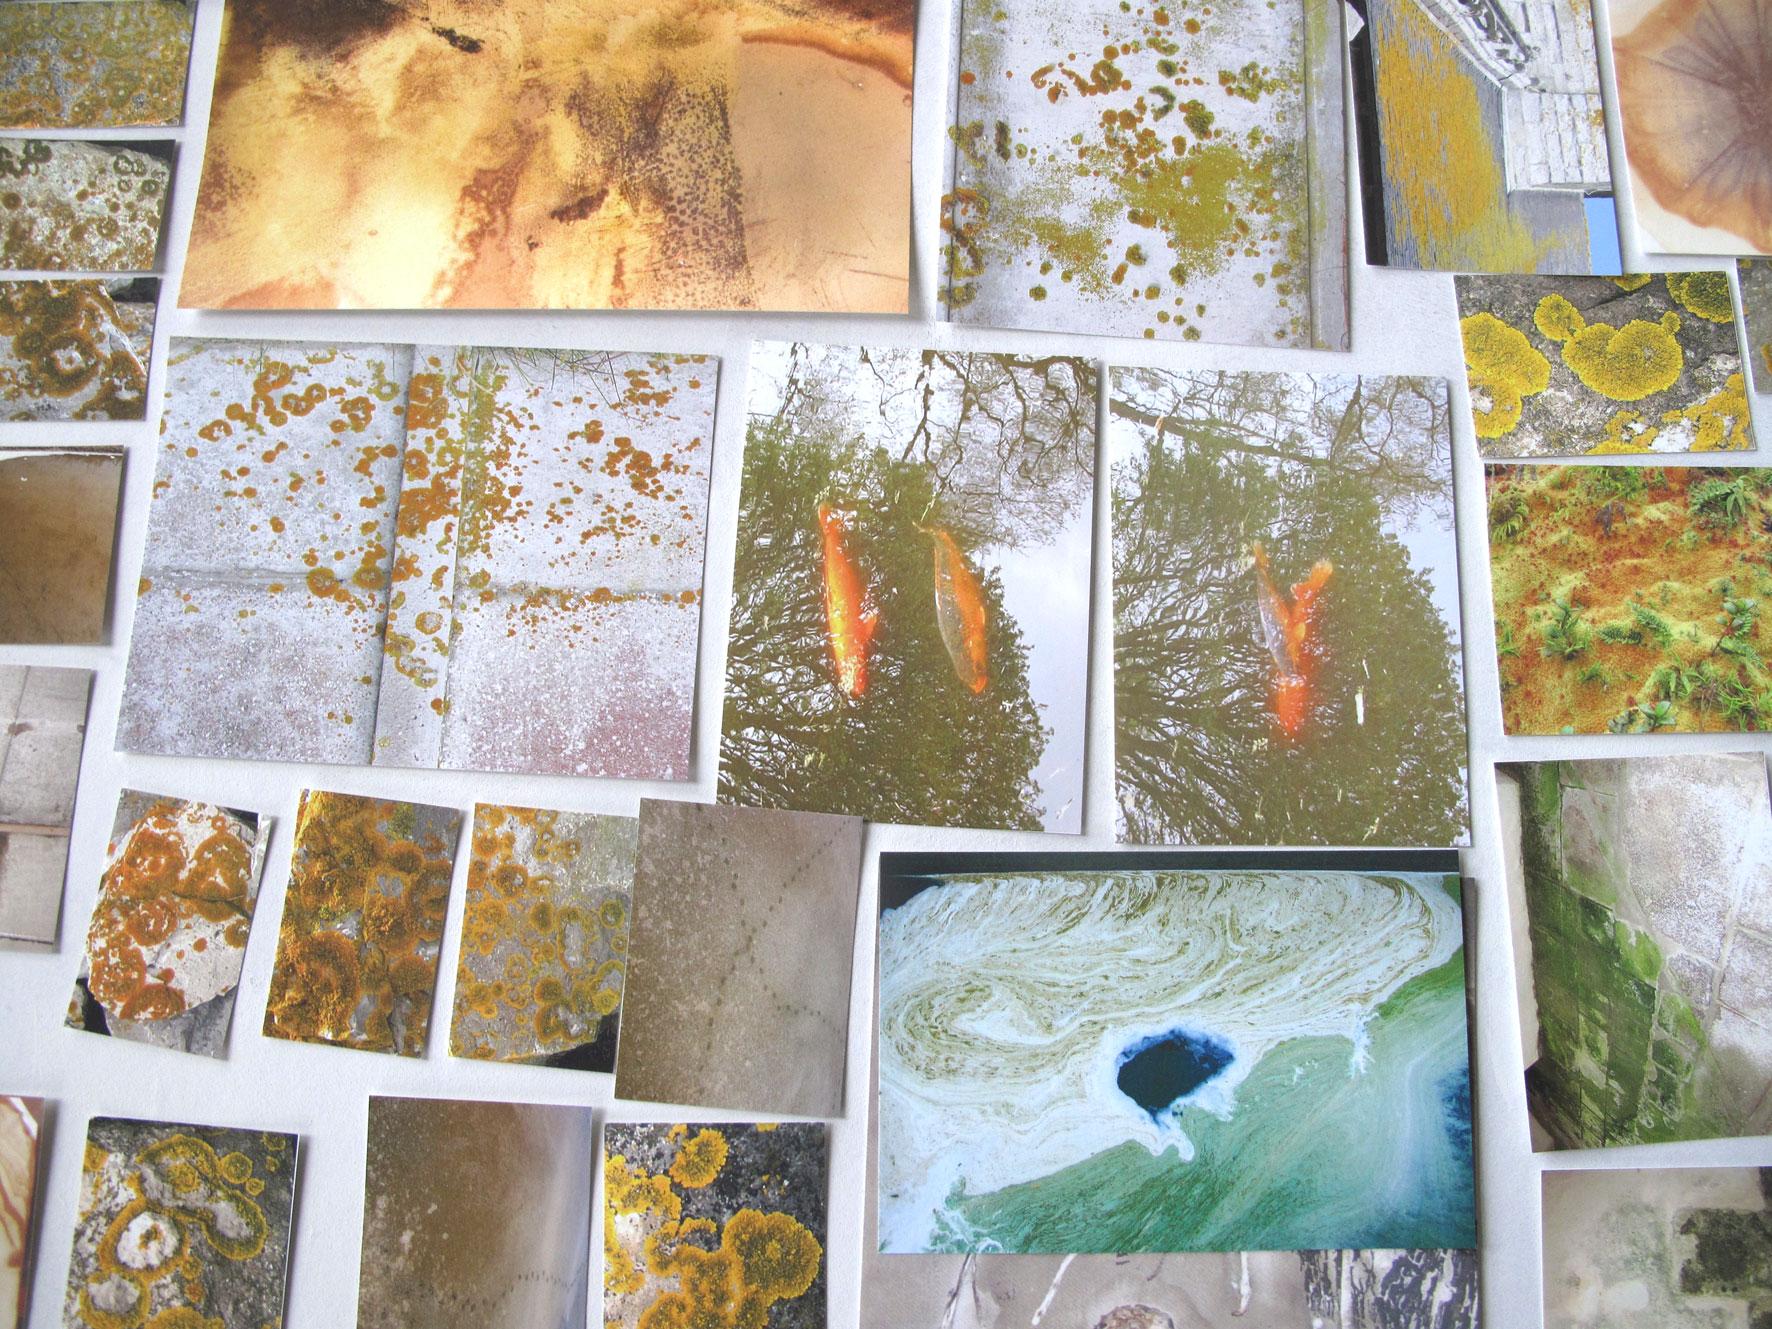 oranje-pagina-uit-archief